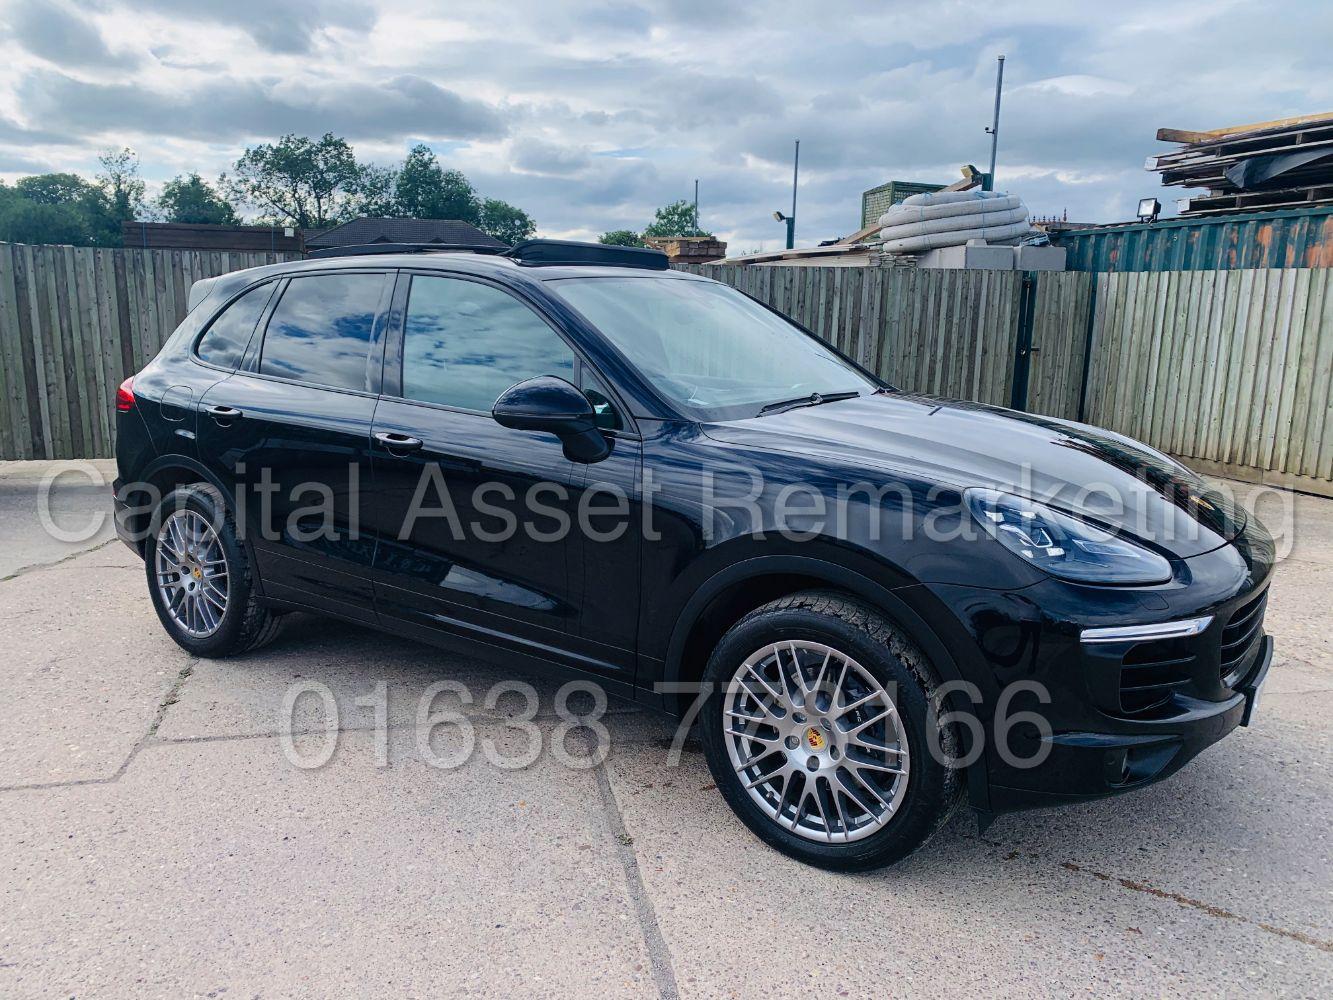 2018 Porsche Cayenne *3.0 V6 Diesel* - 2017 Mitsubishi L200 *Barbarian* - 2016 Range Rover Evoque + Many More: Cars, Commercials & 4x4's !!!